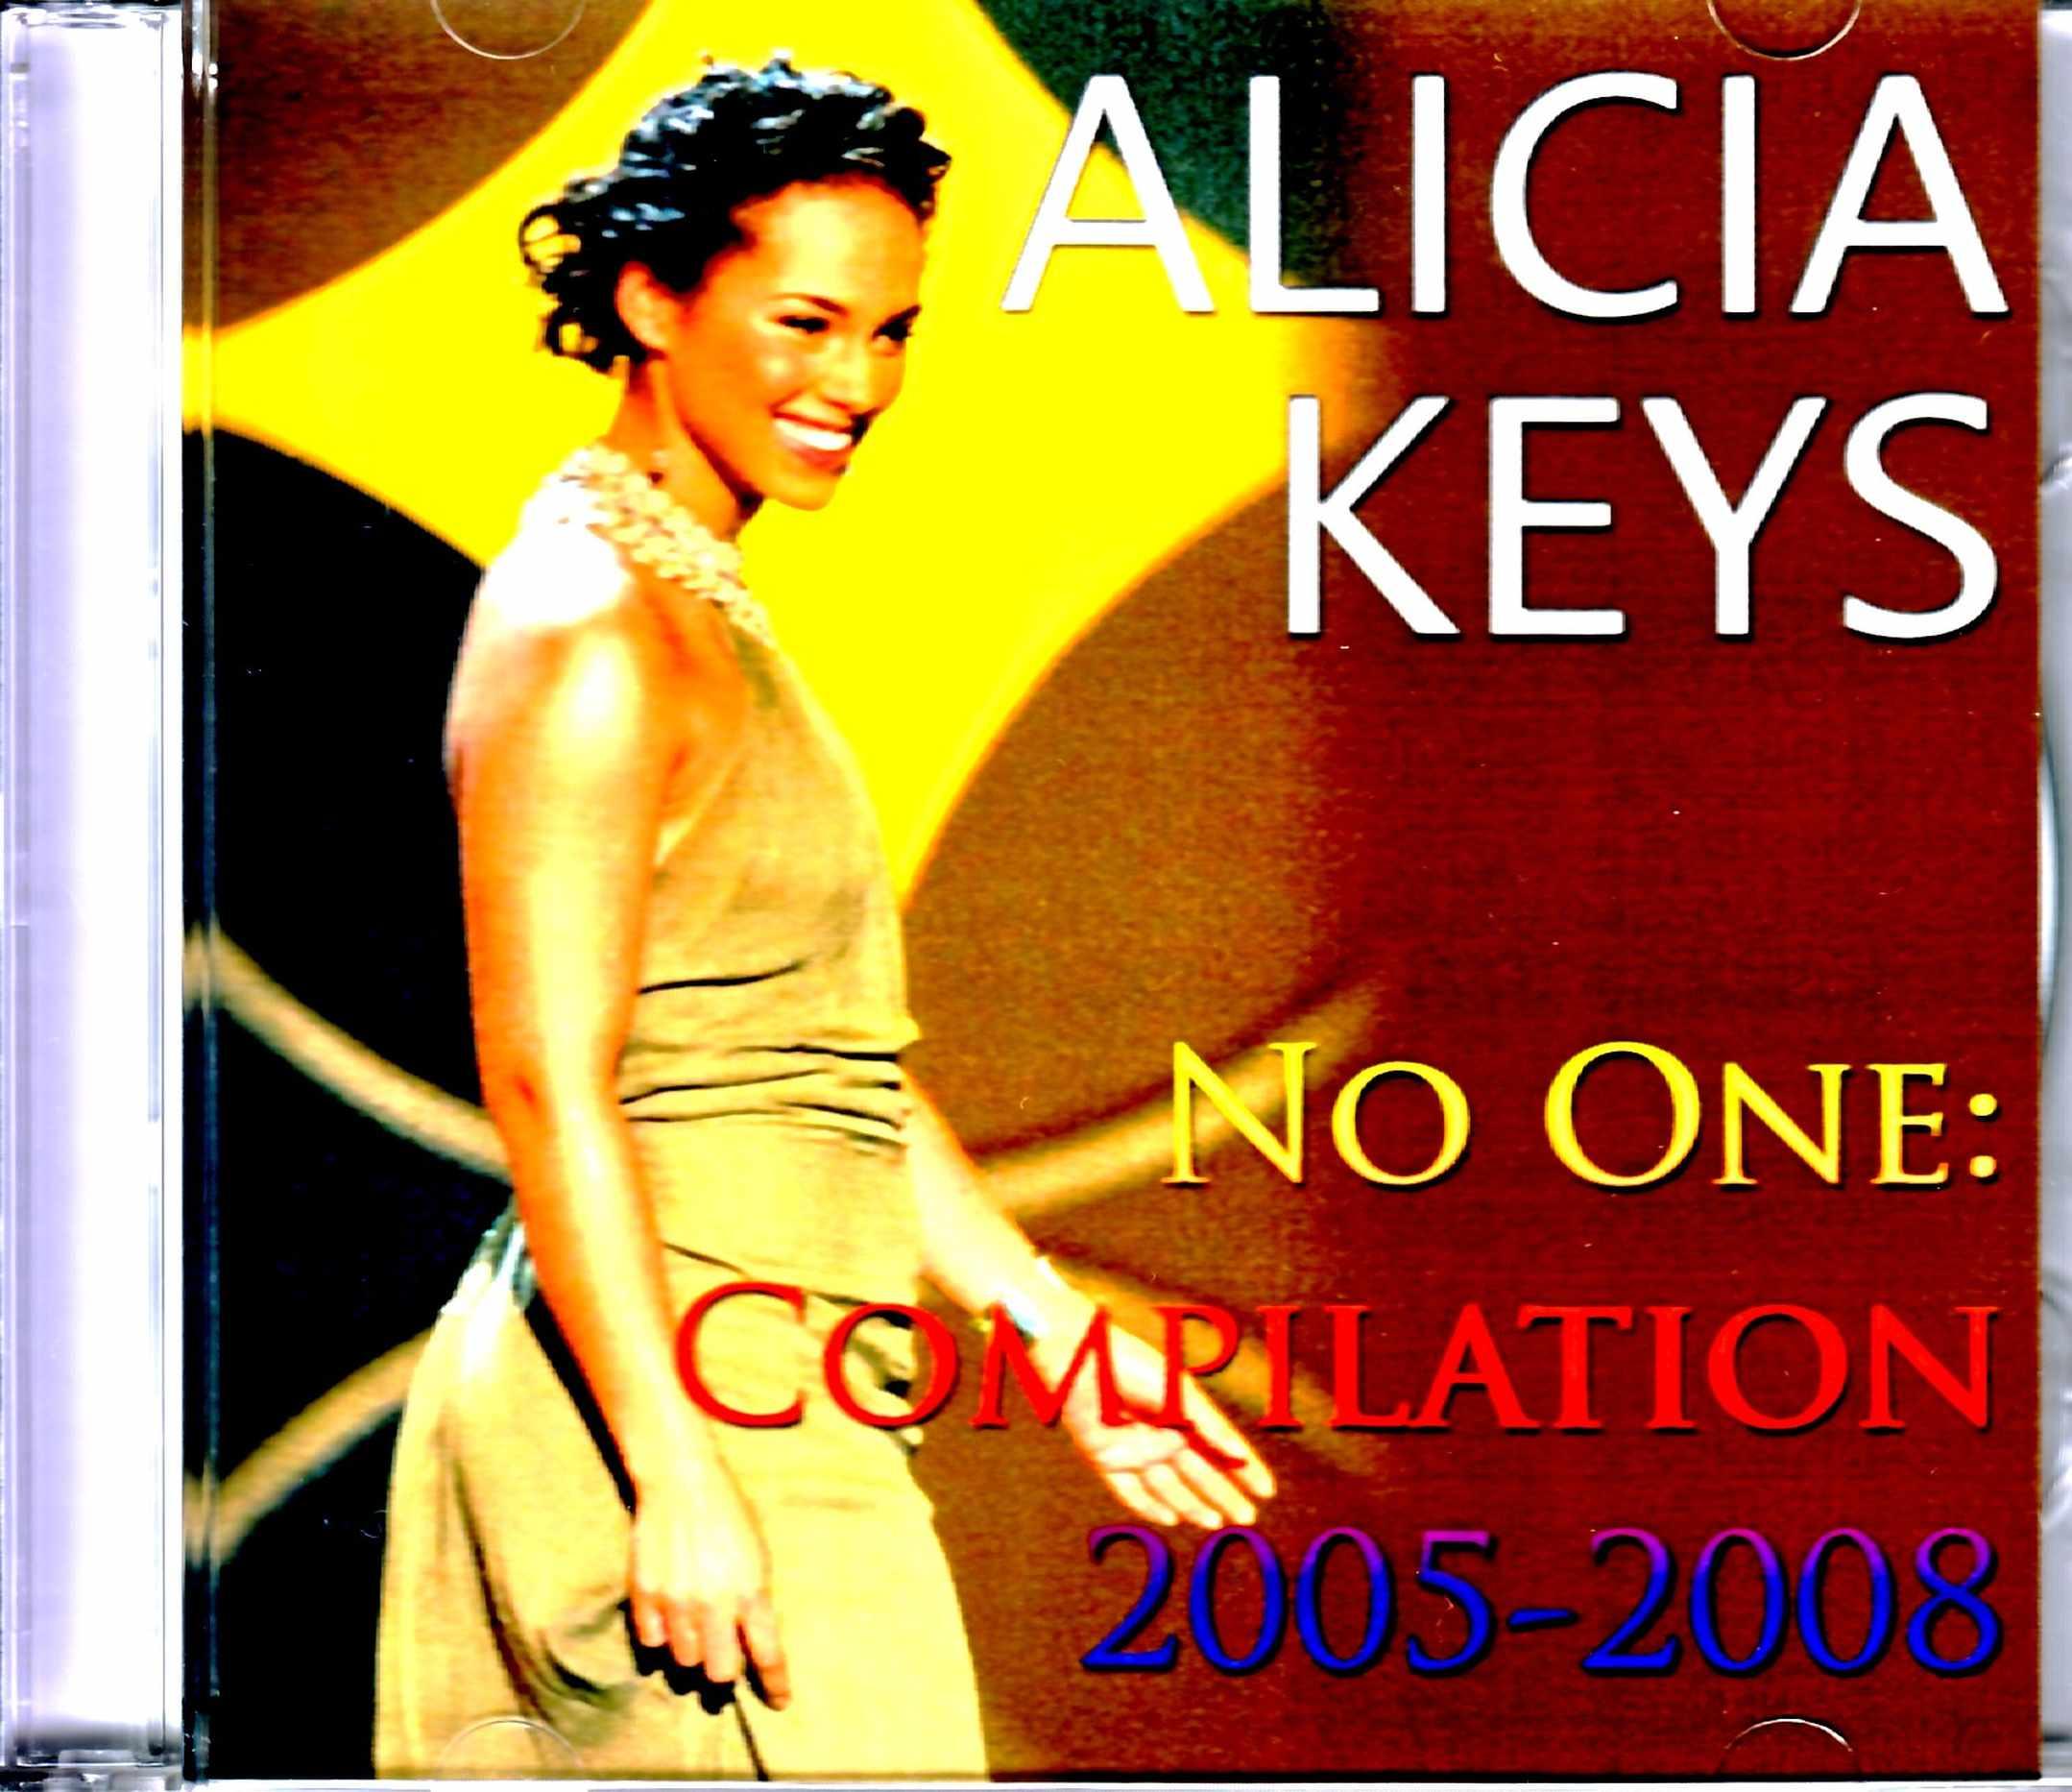 Alicia Keys アリシア・キース/Live Compilation 2005-2008 S & V